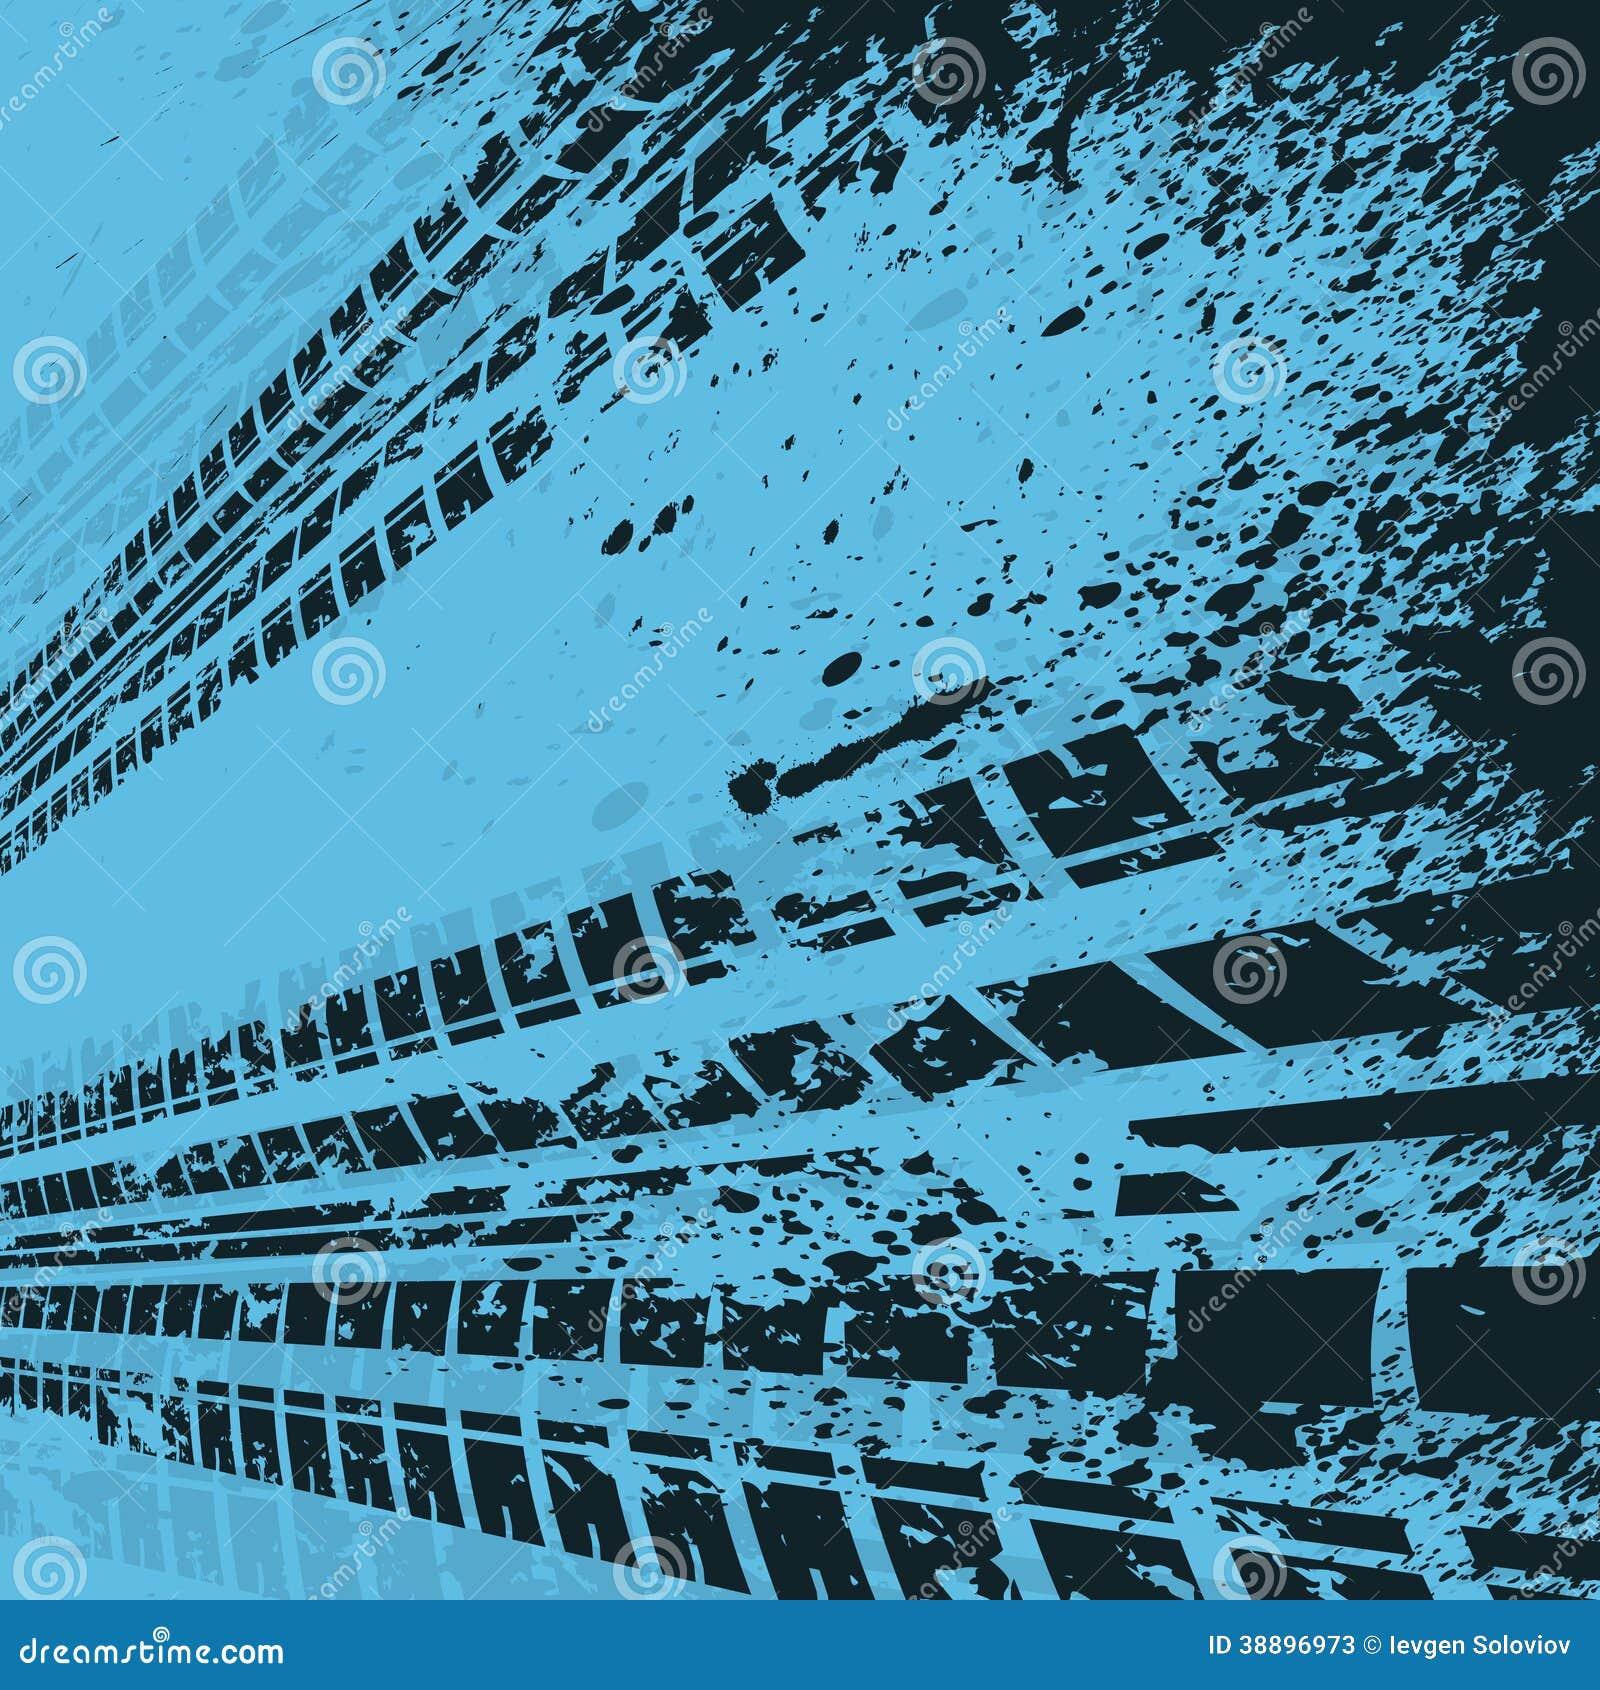 blue tire track background stock vector image 38896973. Black Bedroom Furniture Sets. Home Design Ideas